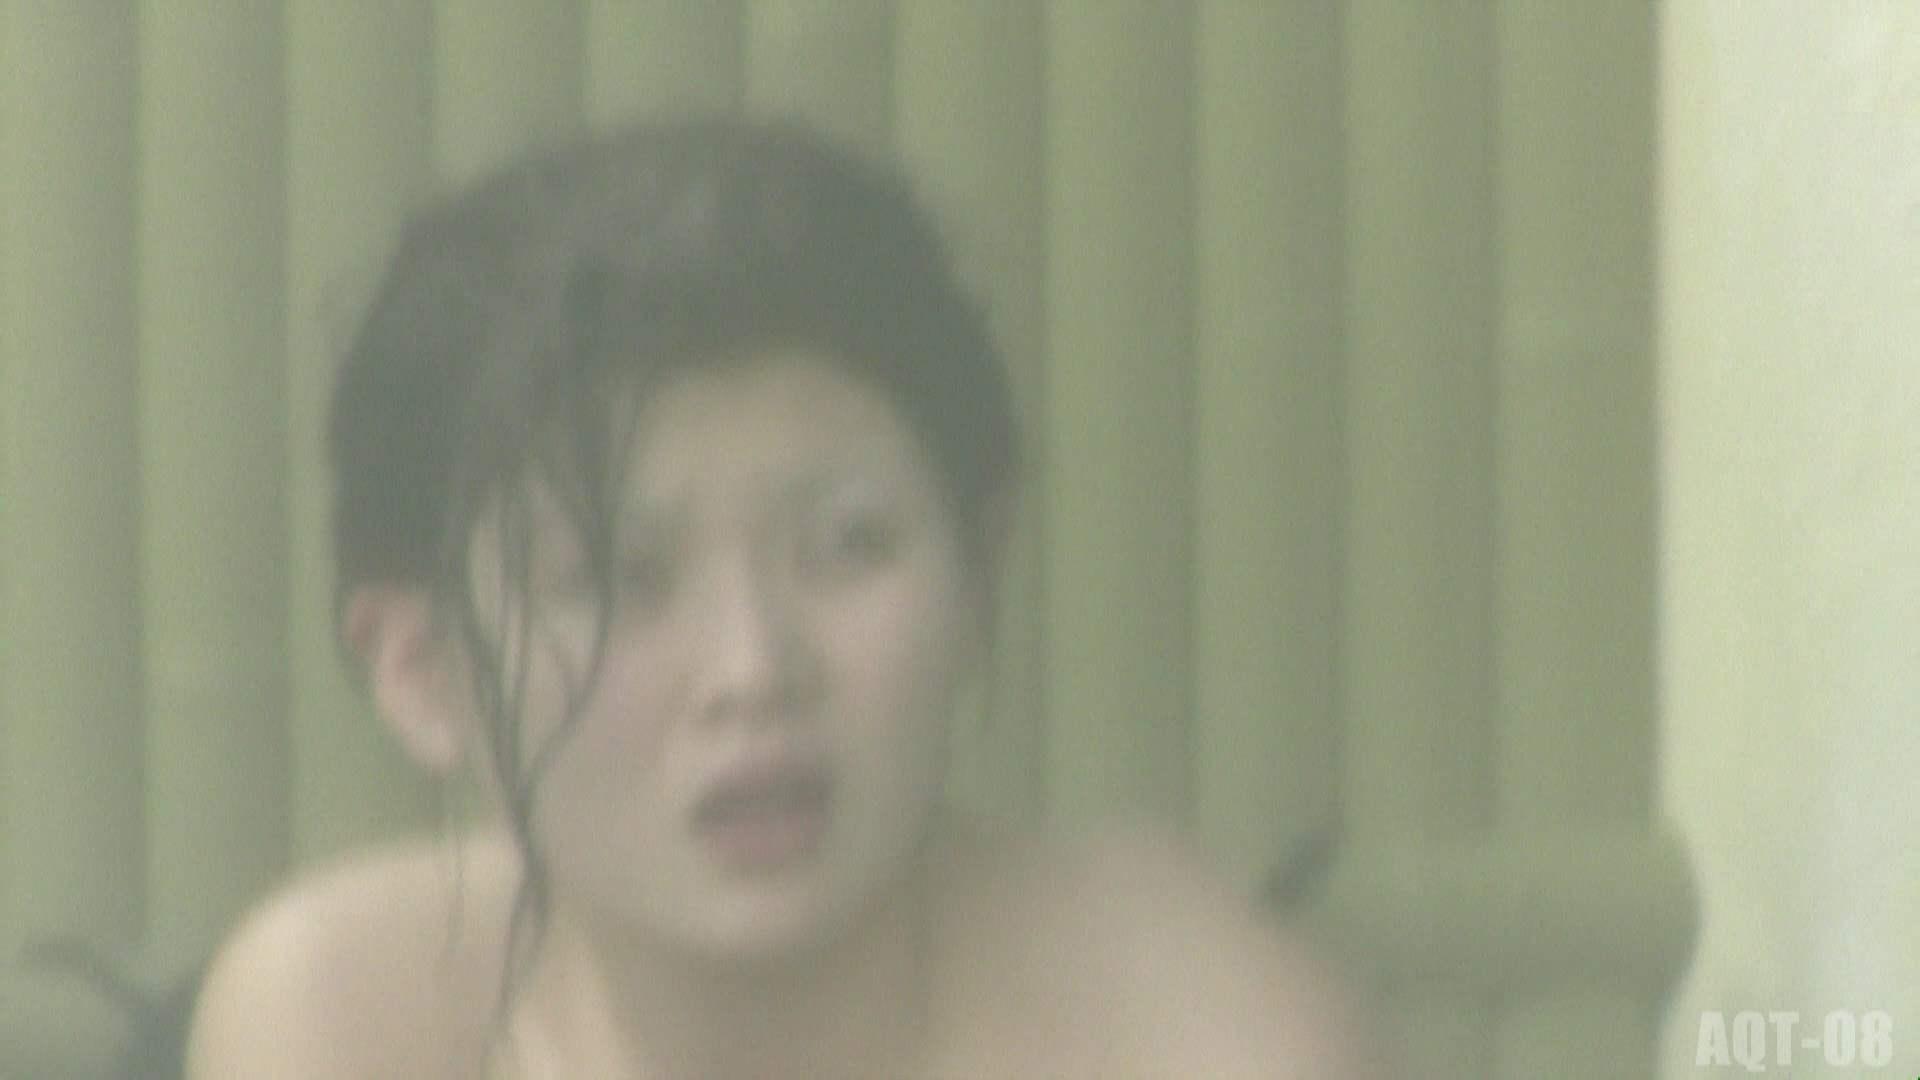 Aquaな露天風呂Vol.777 盗撮   OLエロ画像  78PICs 43